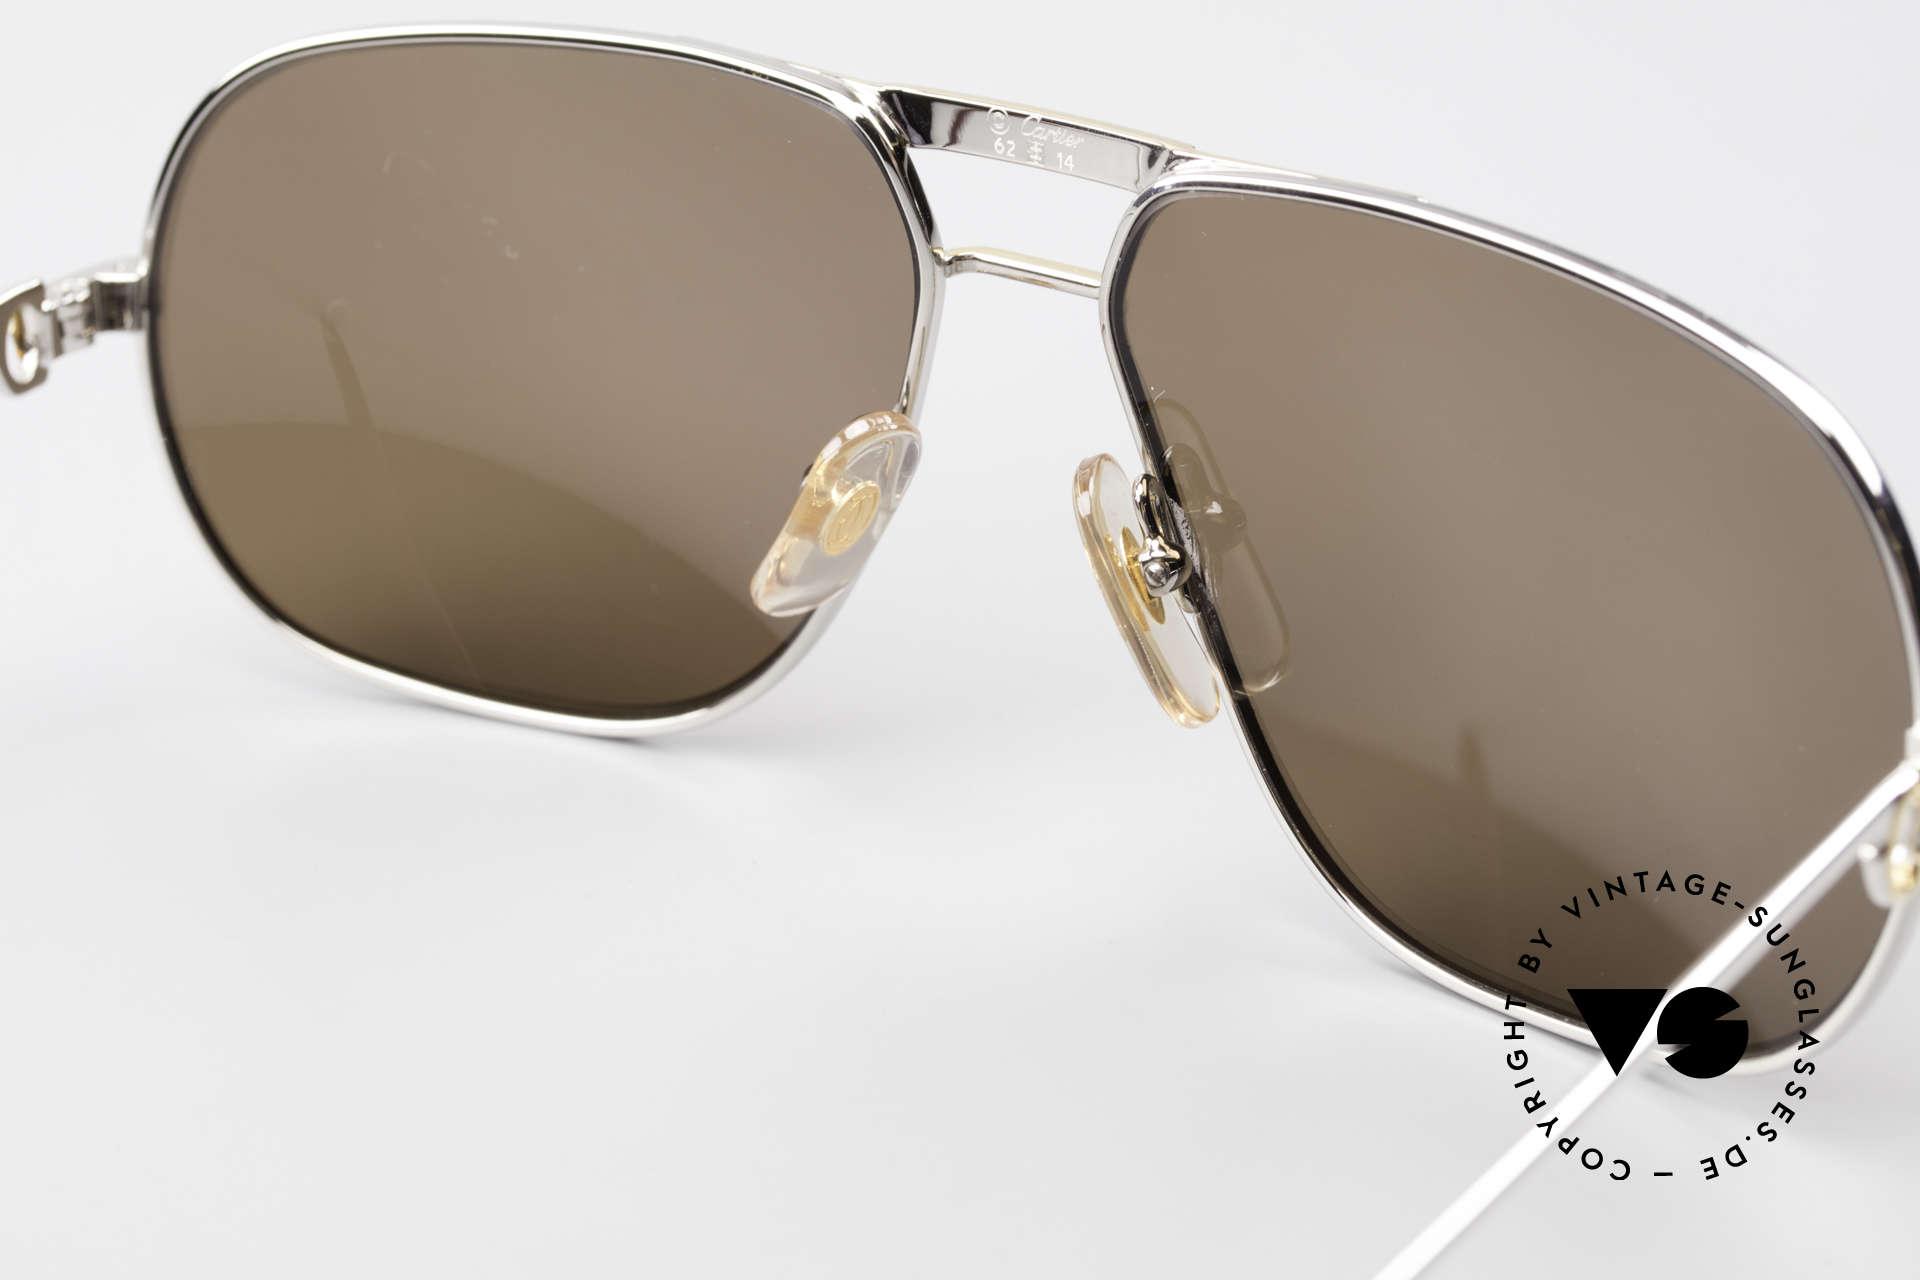 Cartier Tank - L Rare Platinum Finish Shades, NO RETRO eyewear; a rare 30 years old vintage ORIGINAL!, Made for Men